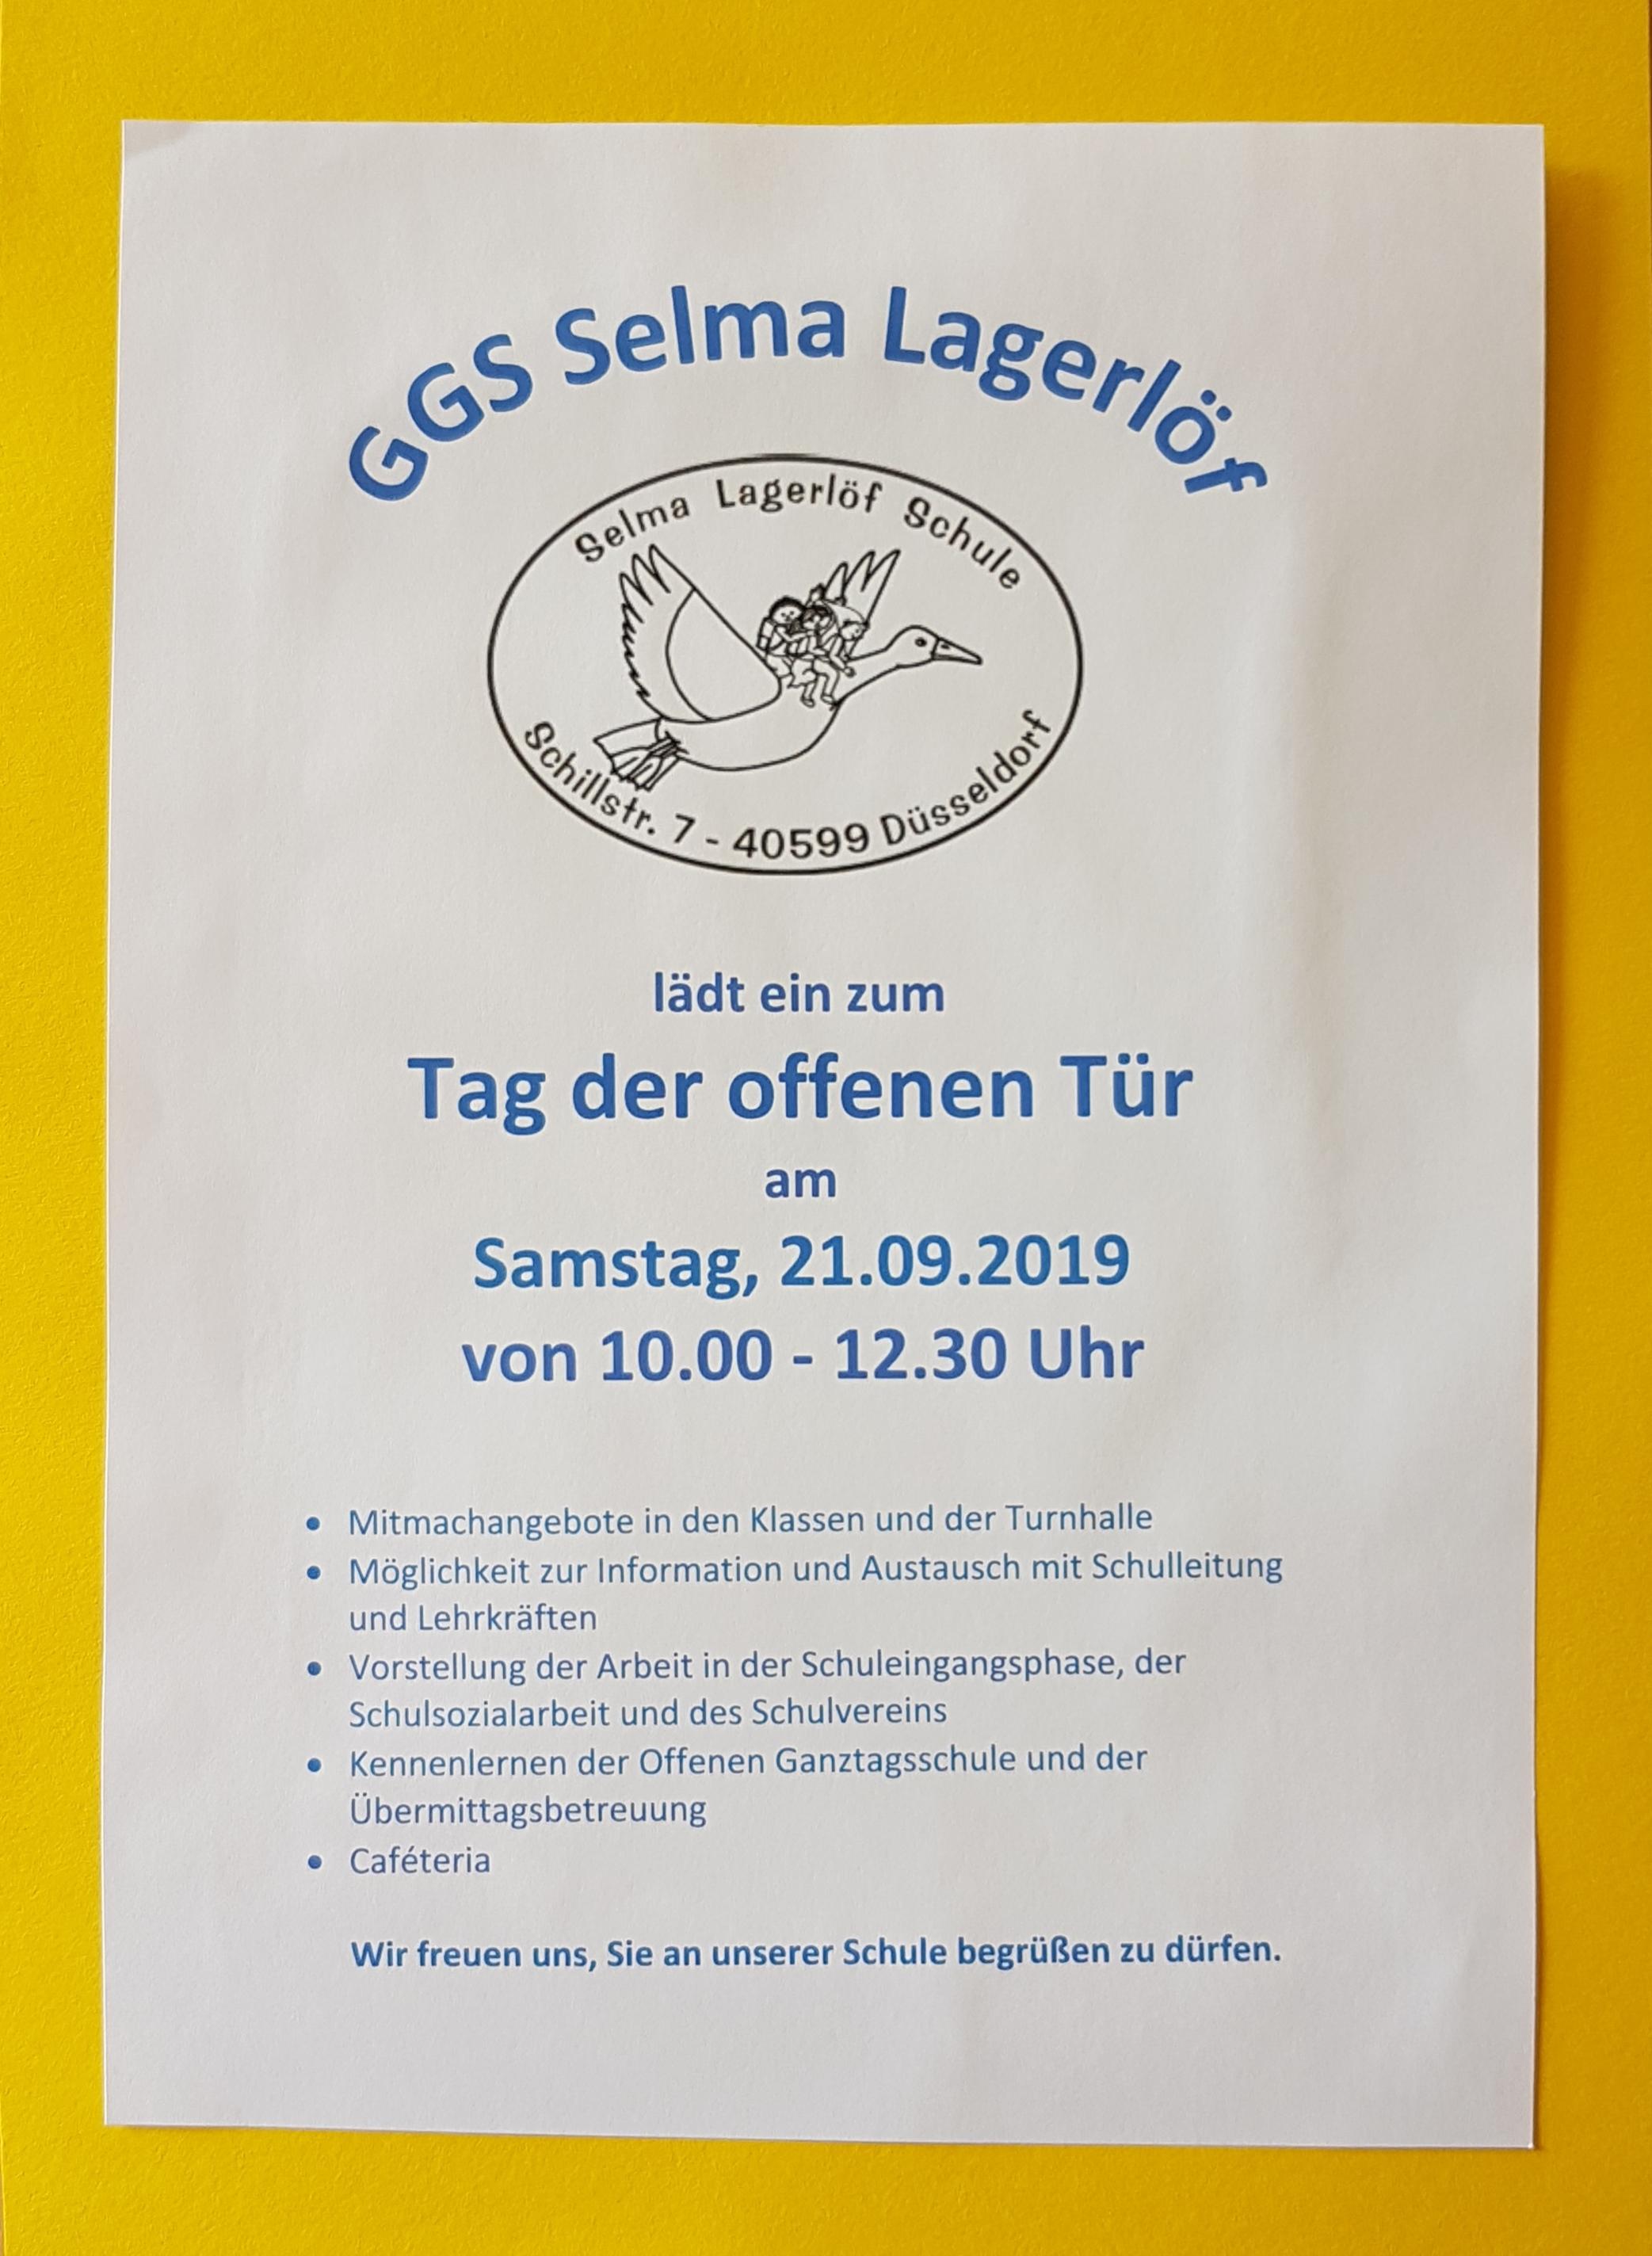 Selma Lagerloef Grundschule